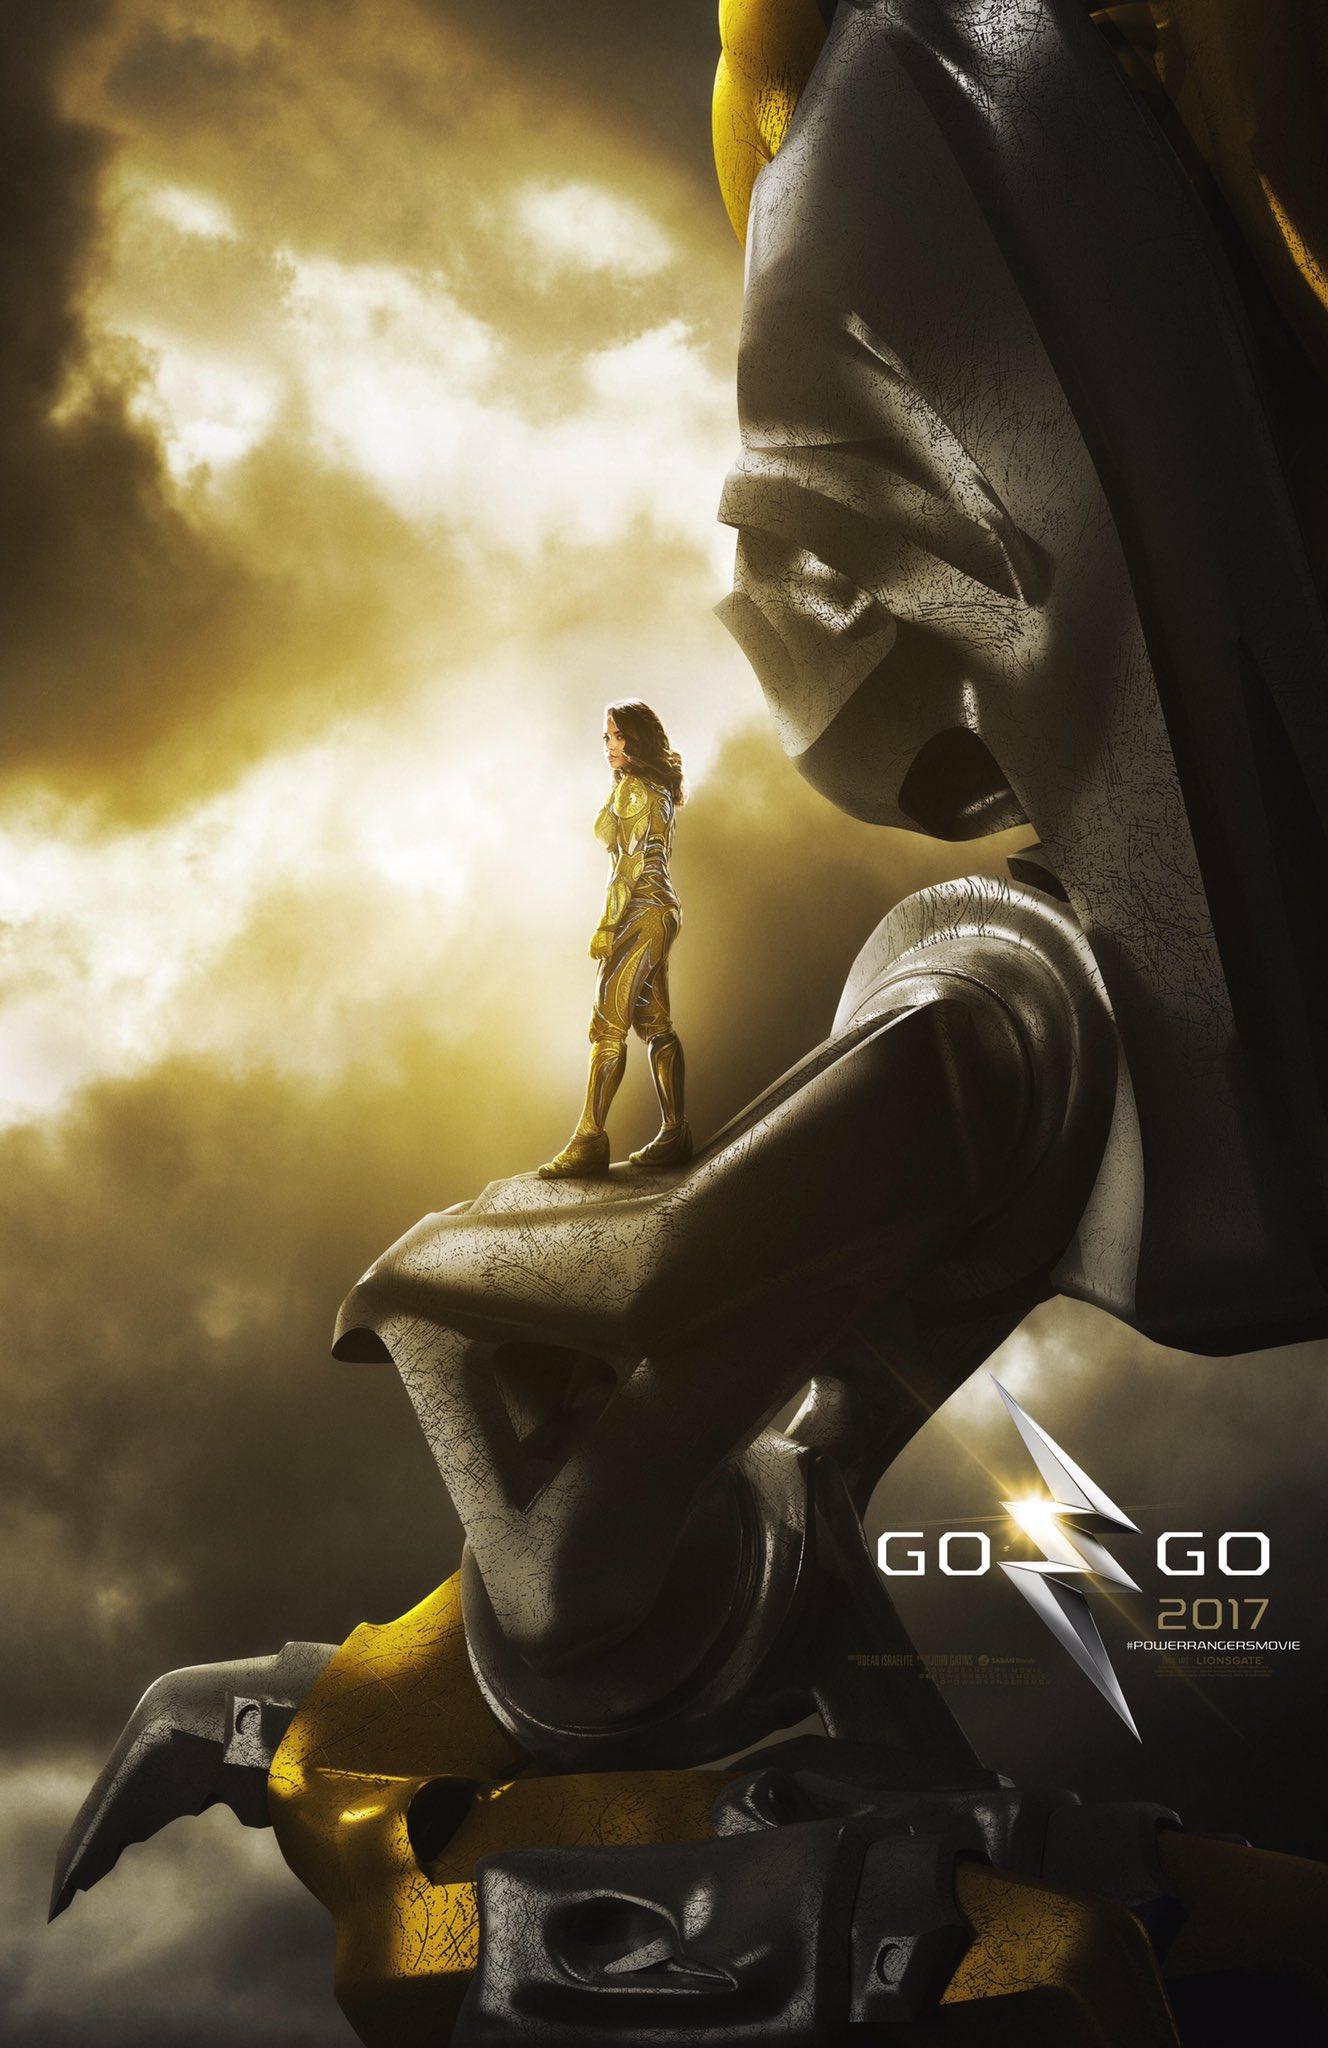 Промо-видео с NYCC-2016: John Wick: Chapter 2, Power Rangers, The Great Wall и Ninjak VS. The Valiant Universe 13